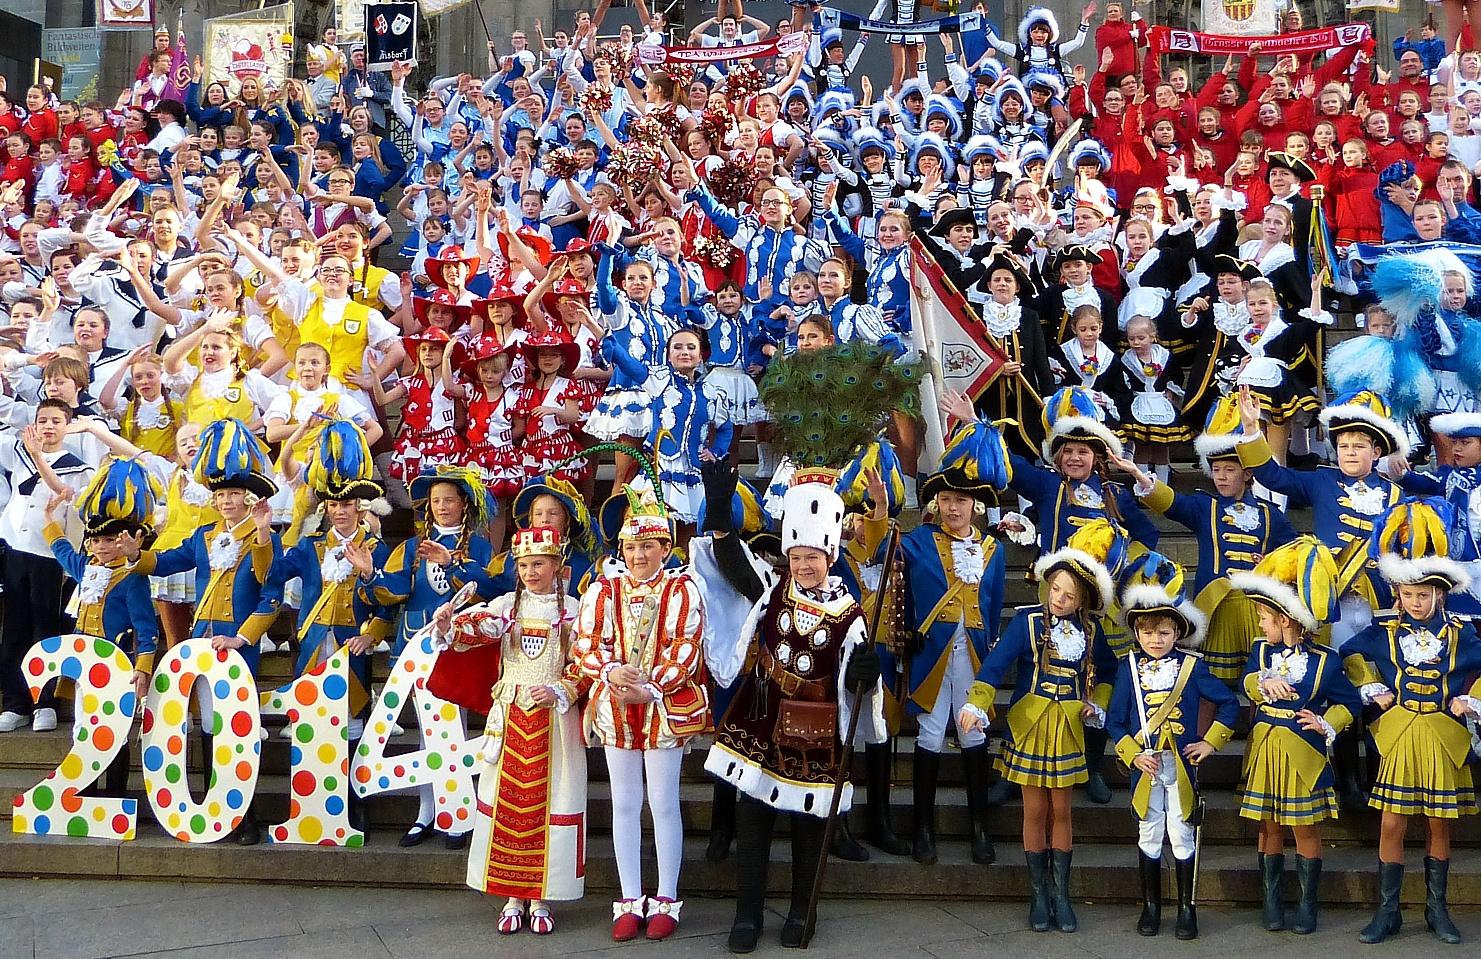 Karneval In Köln Bilder